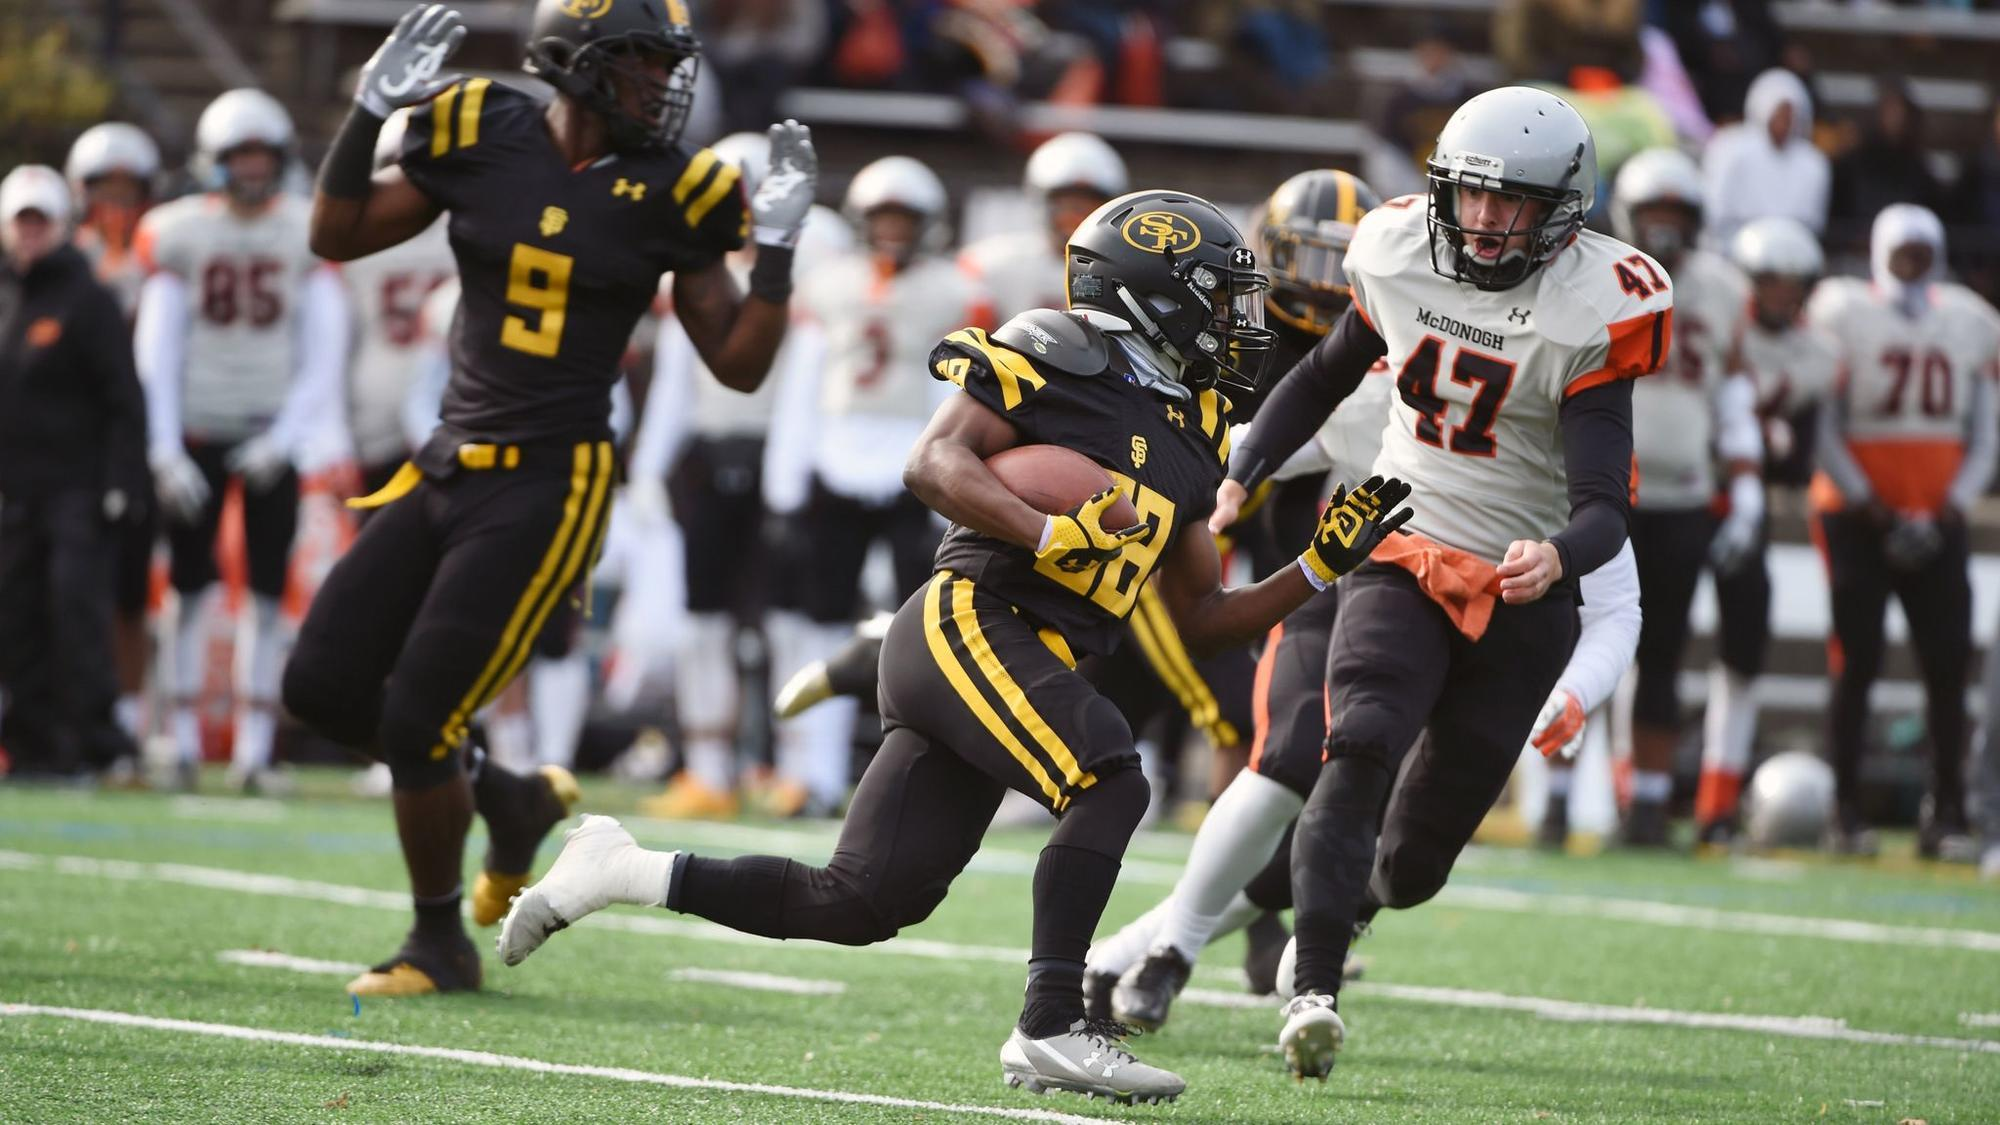 Varsity football: How the Top 15 fared in Week 11